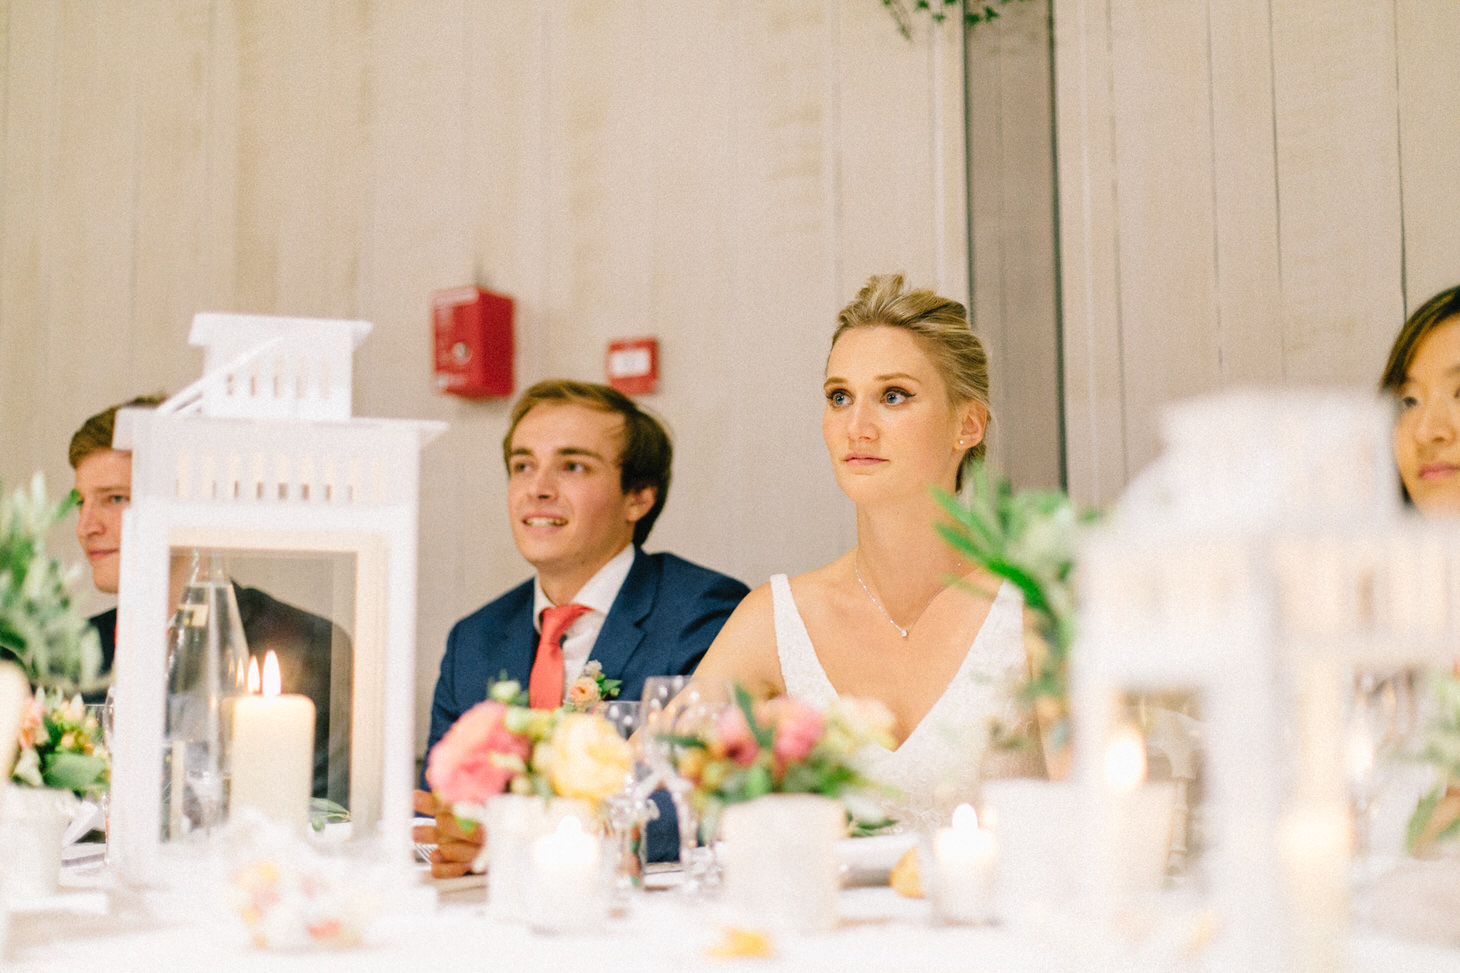 photographe-mariage-paris-montfort-l-amaury-094